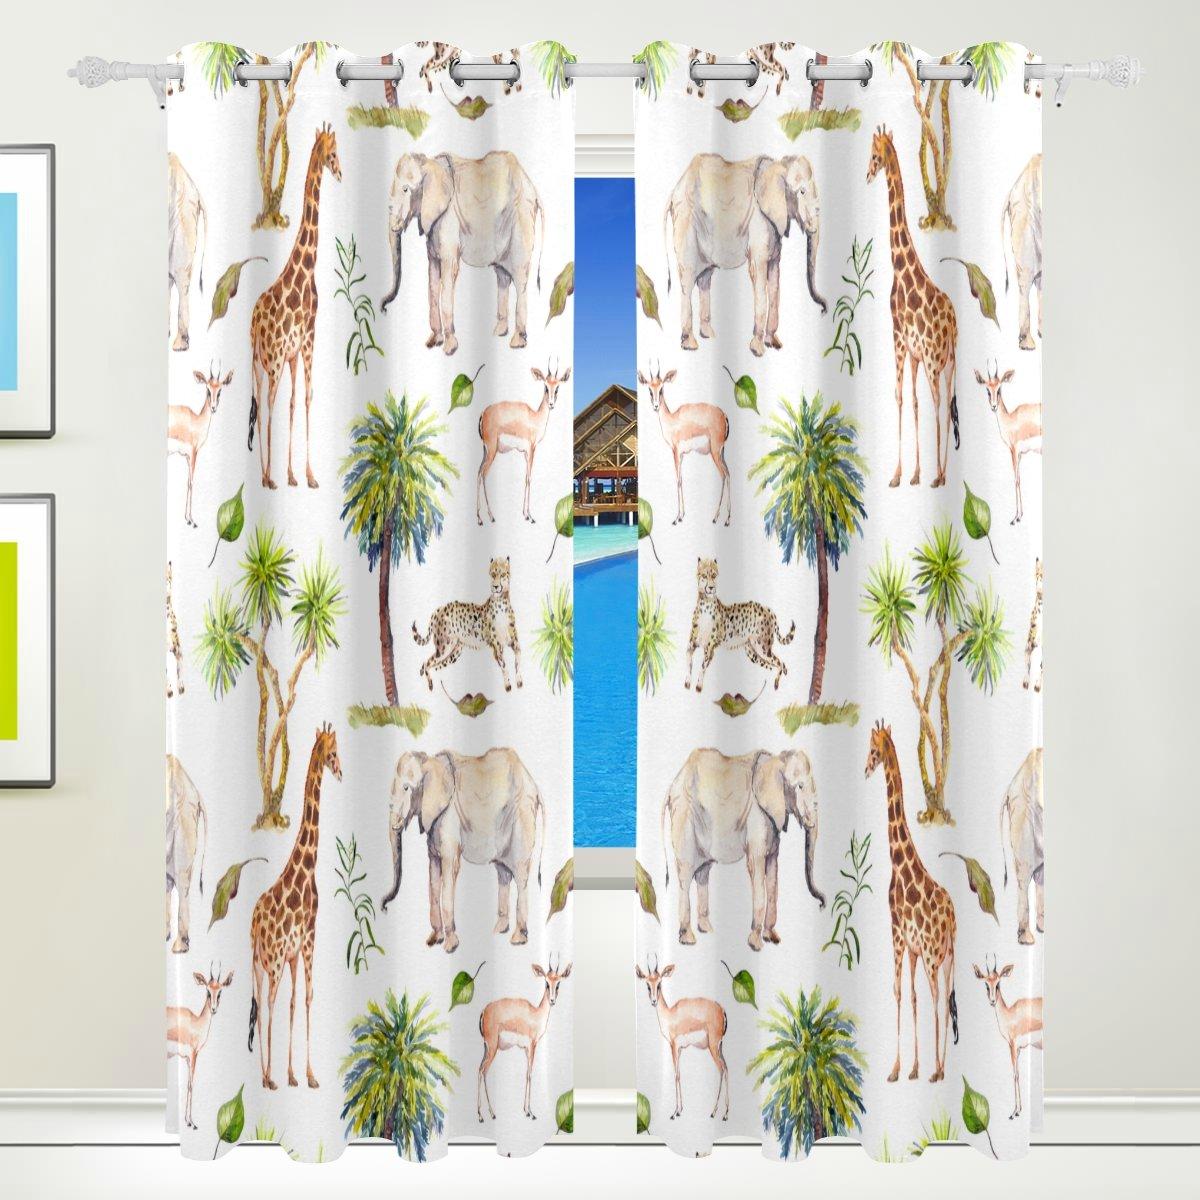 Vantaso Window Curtains 84 Inch Long Forest Animal Elephant Deer Giraffe for Kids Girls Boys Bedroom Living Room Polyester 2 Pannels